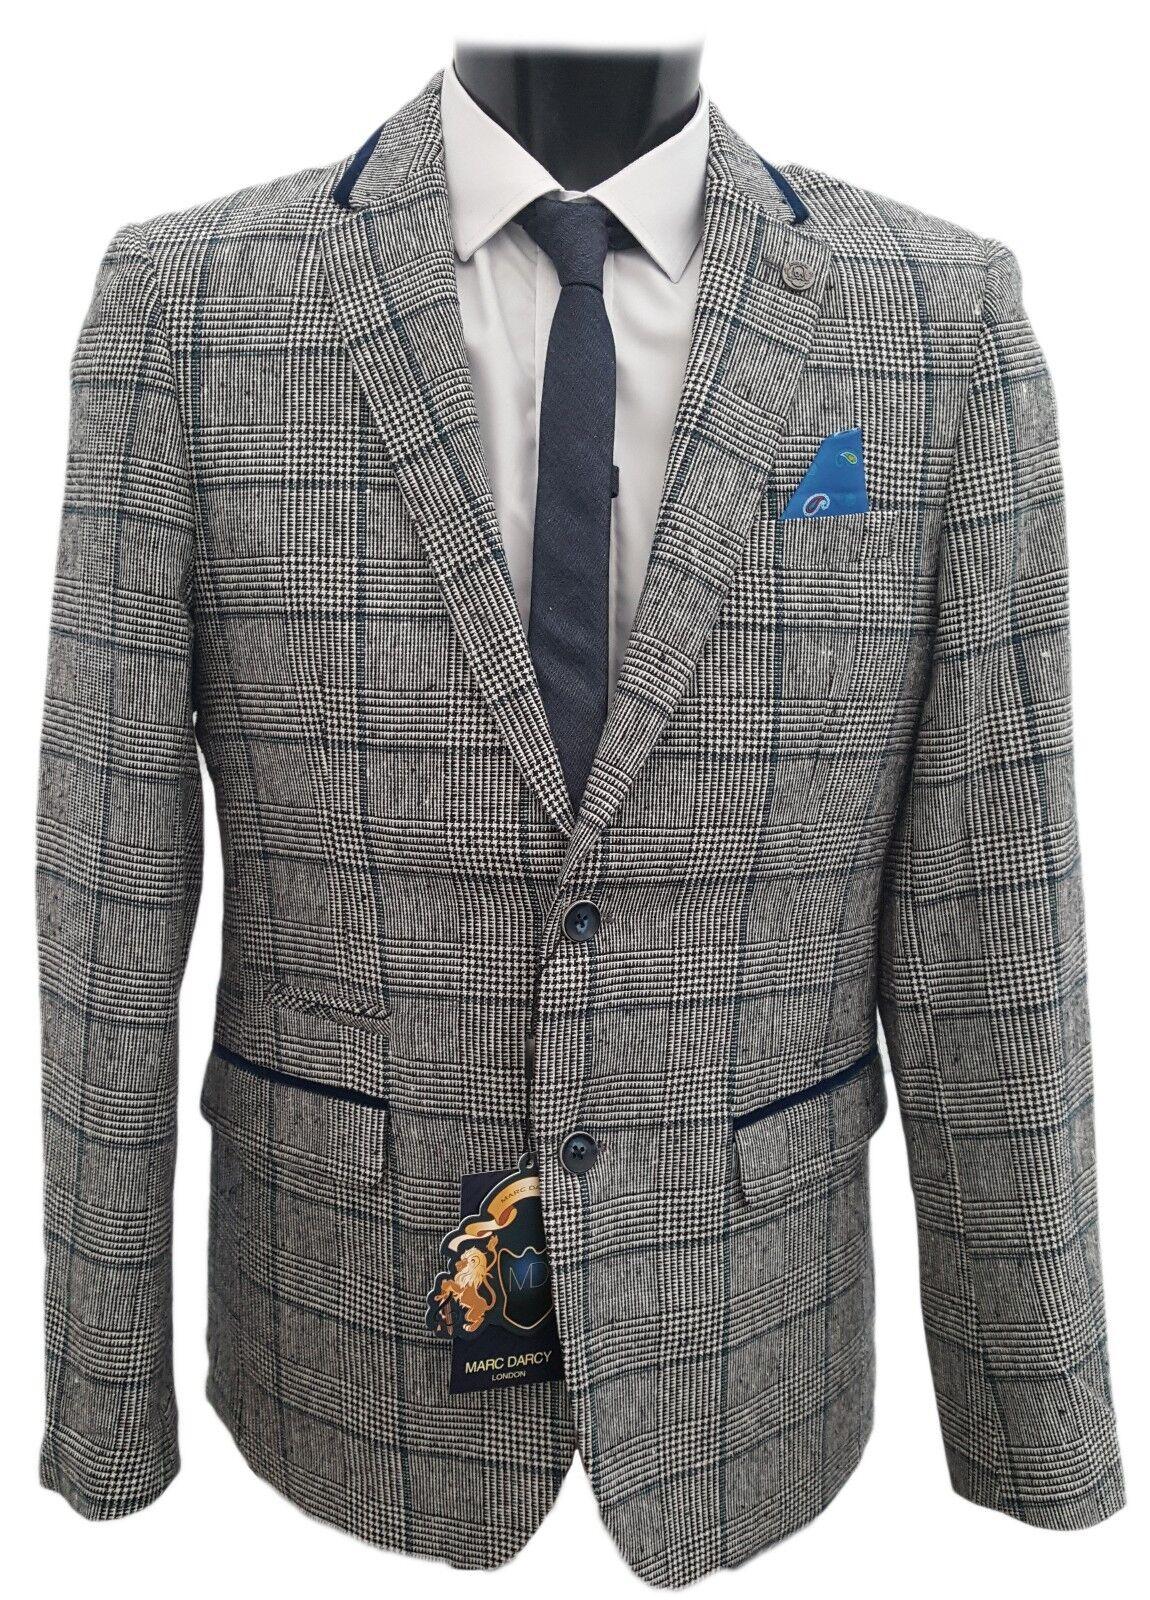 Herren Marc Darcy Designer Kariert Tweed-Blazer Kirk - Grau/Marineblau